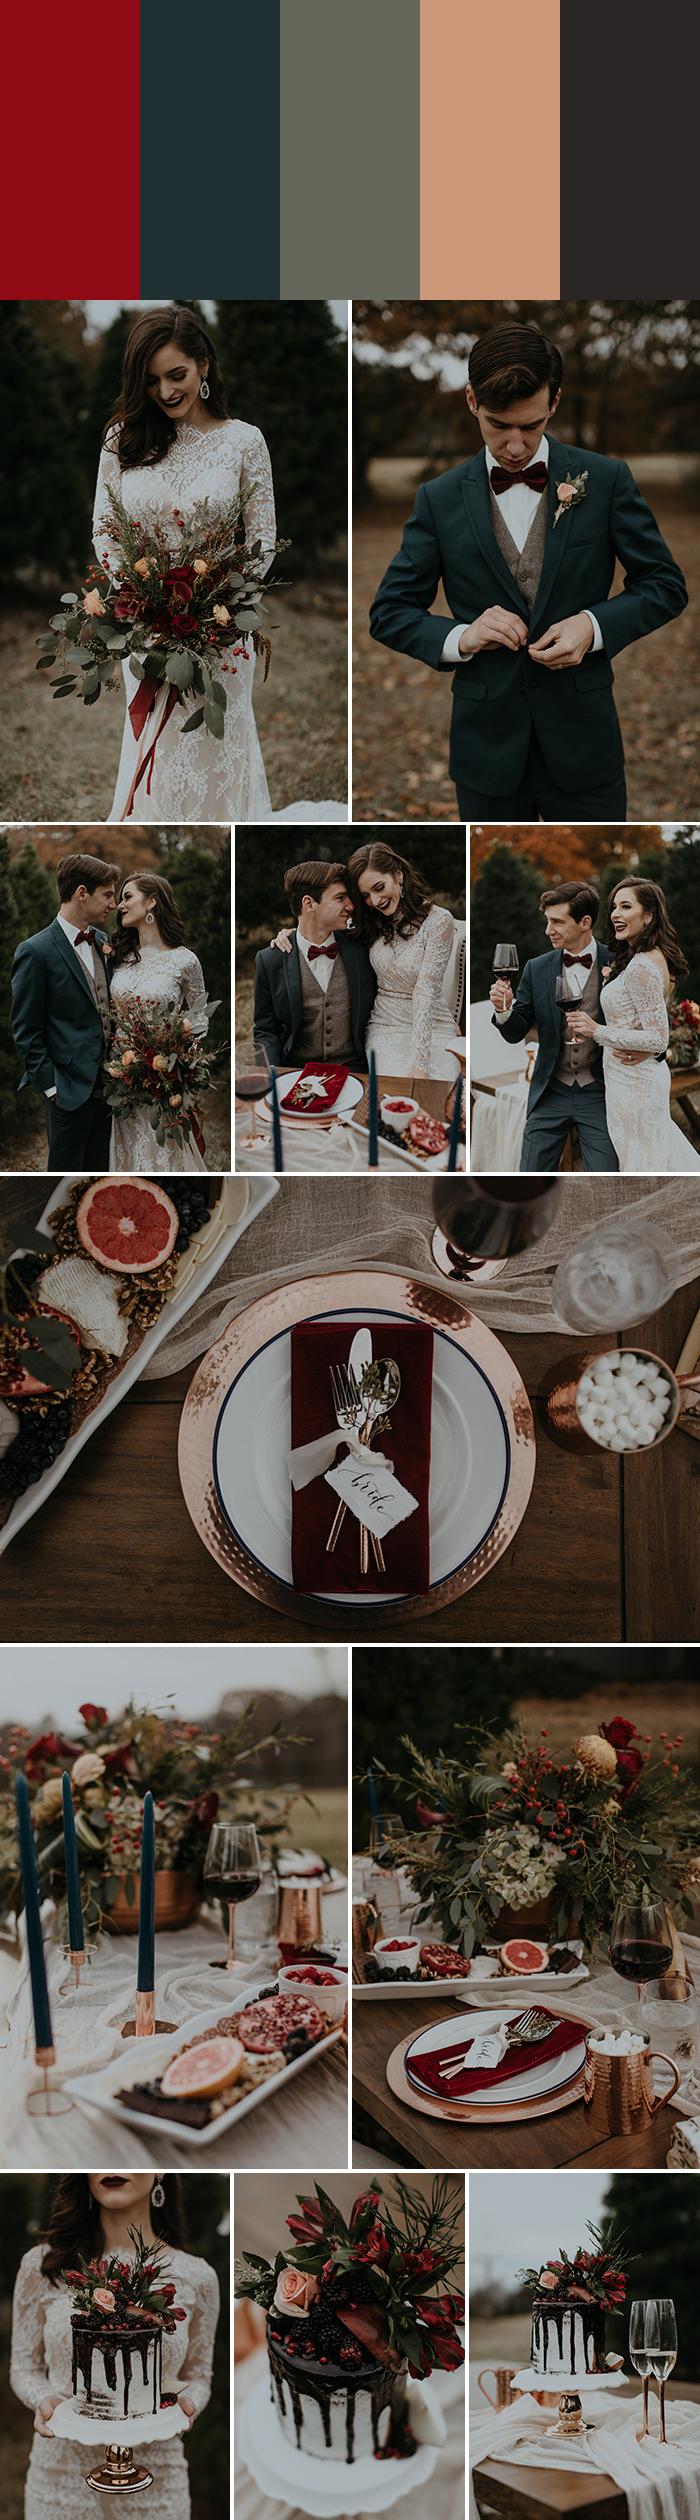 Christmas Wedding Colors.5 Palette Ideas For Winter Wedding Colors Junebug Weddings